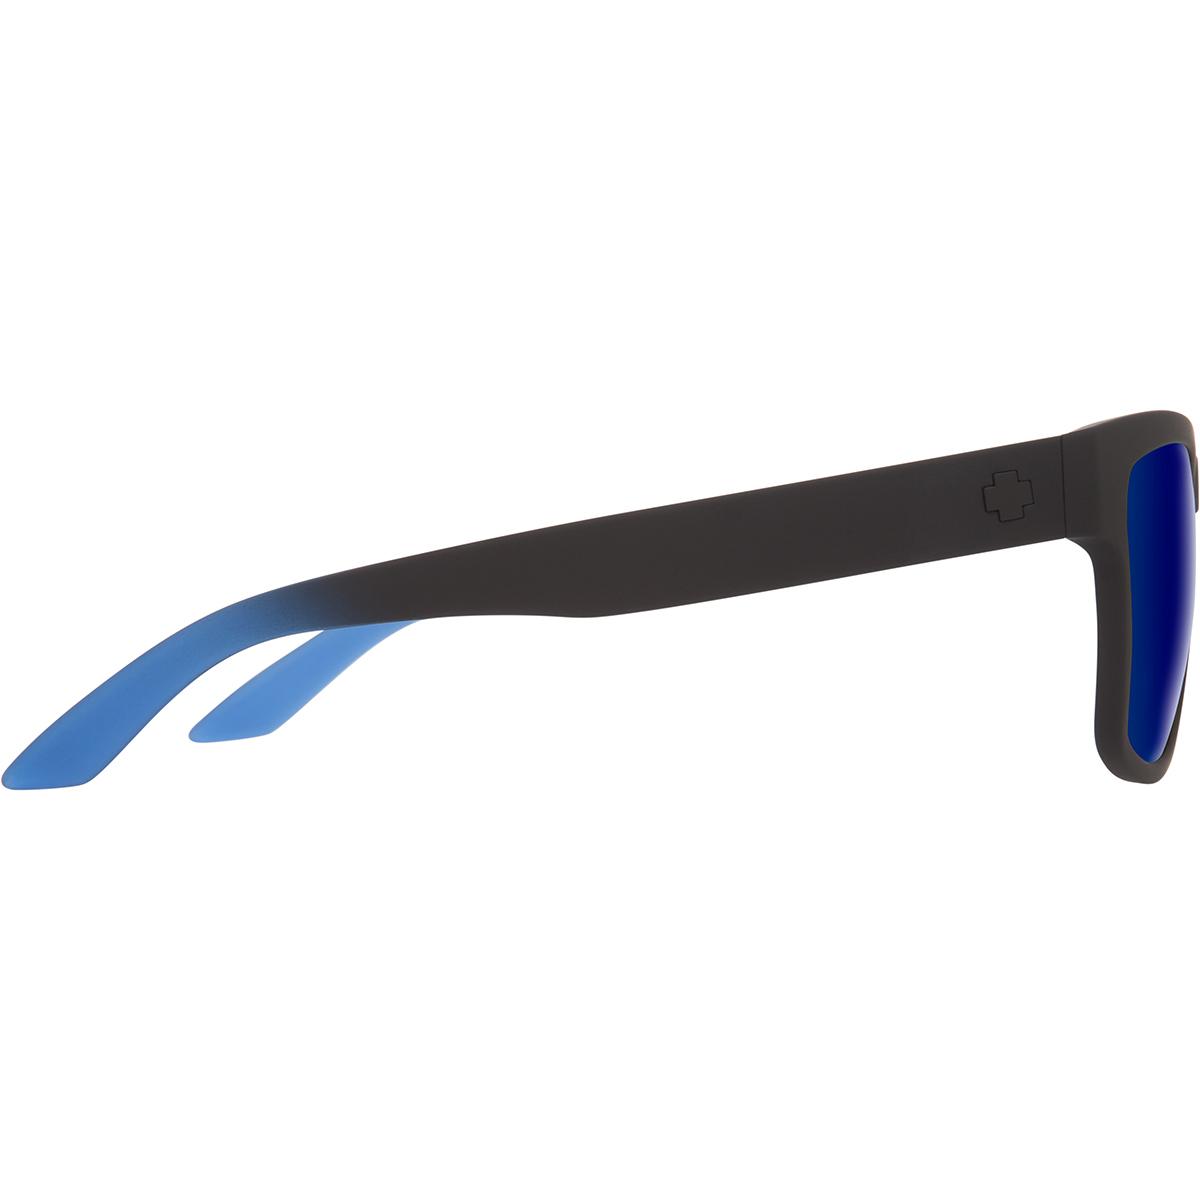 SPY SUNGLASSES スパイ サングラス HAIGHT 2 ヘイト SOFT MATTE BLACK/BLUE FADE - HAPPY GRAY GREEN w/ DARK BLUE FLASH 673232282706